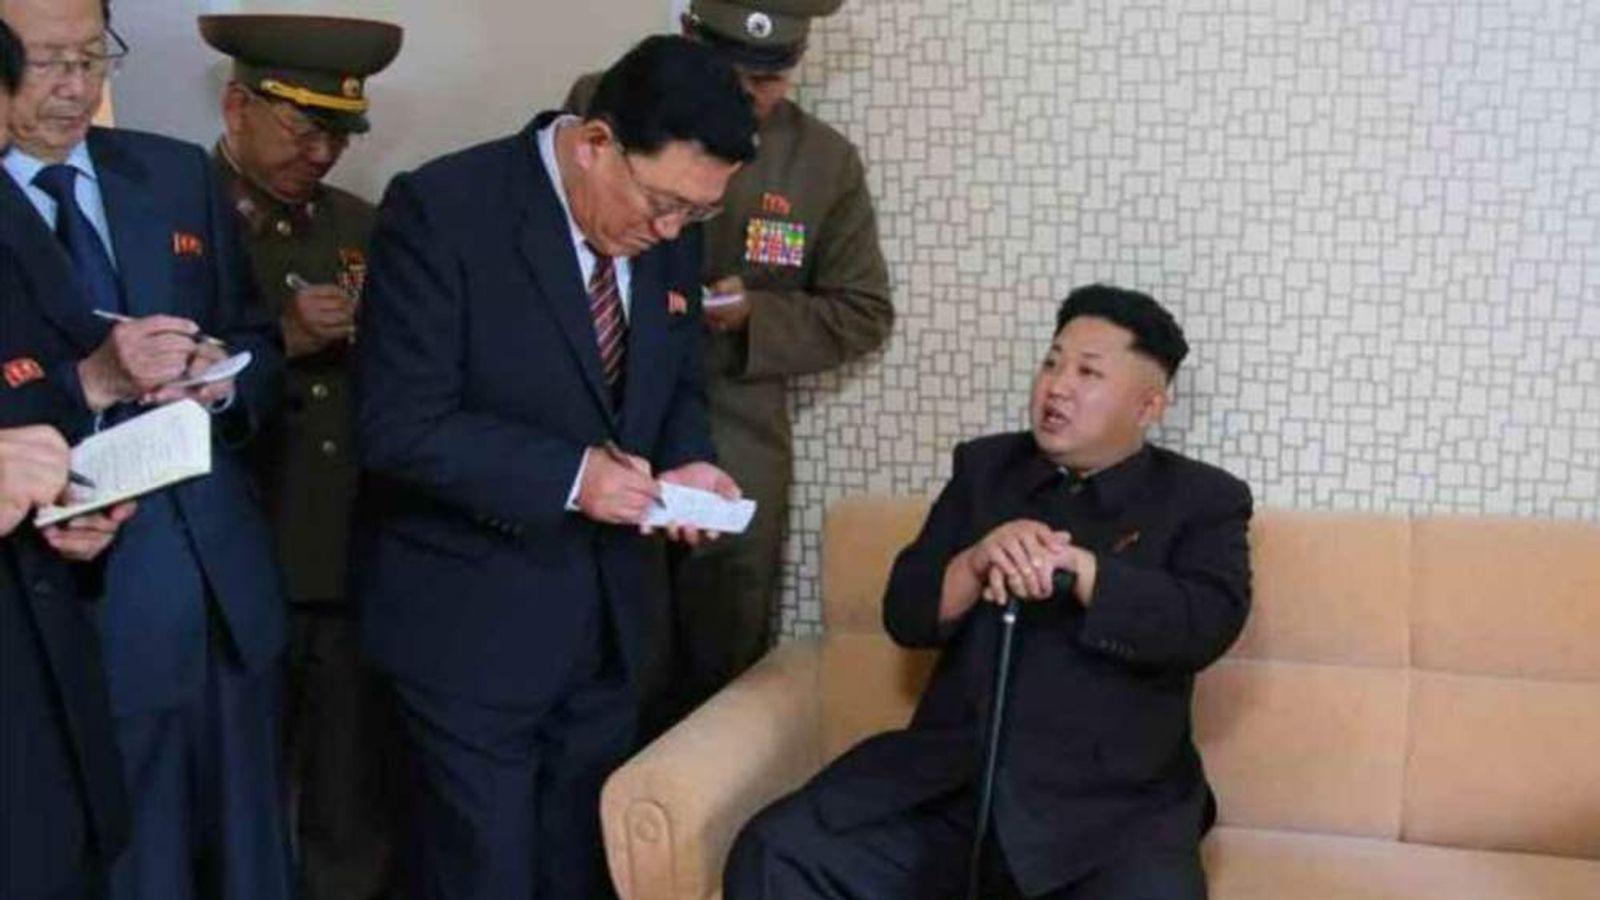 Kim Jong-Un Latest Images In North Korean Newspaper